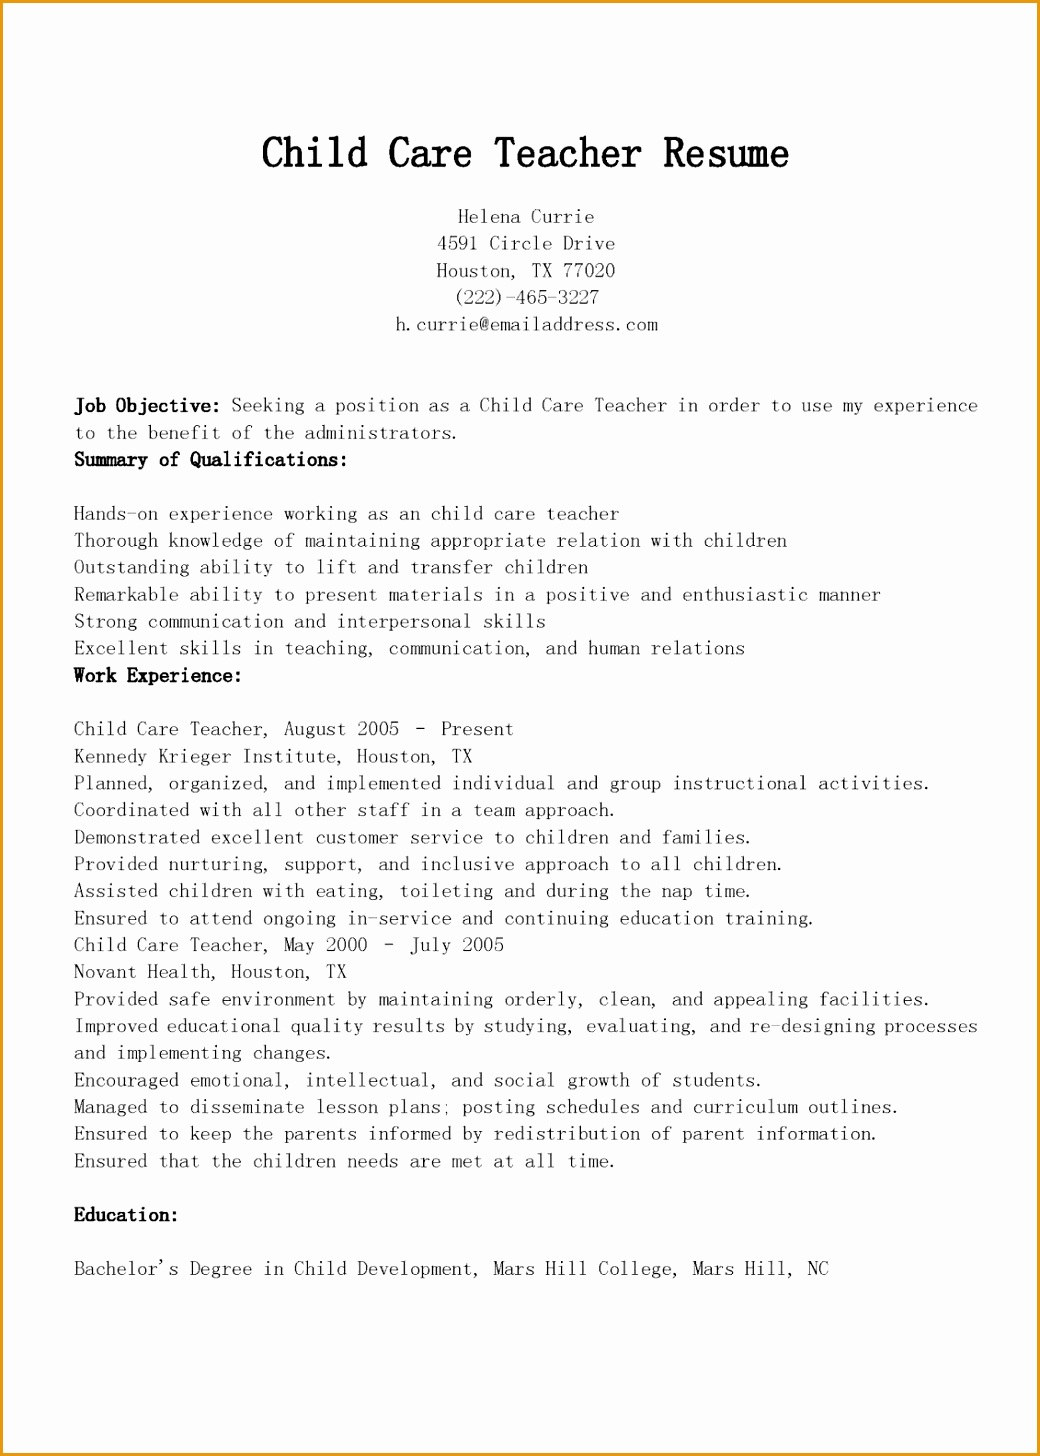 child care teacher resume sample14561040